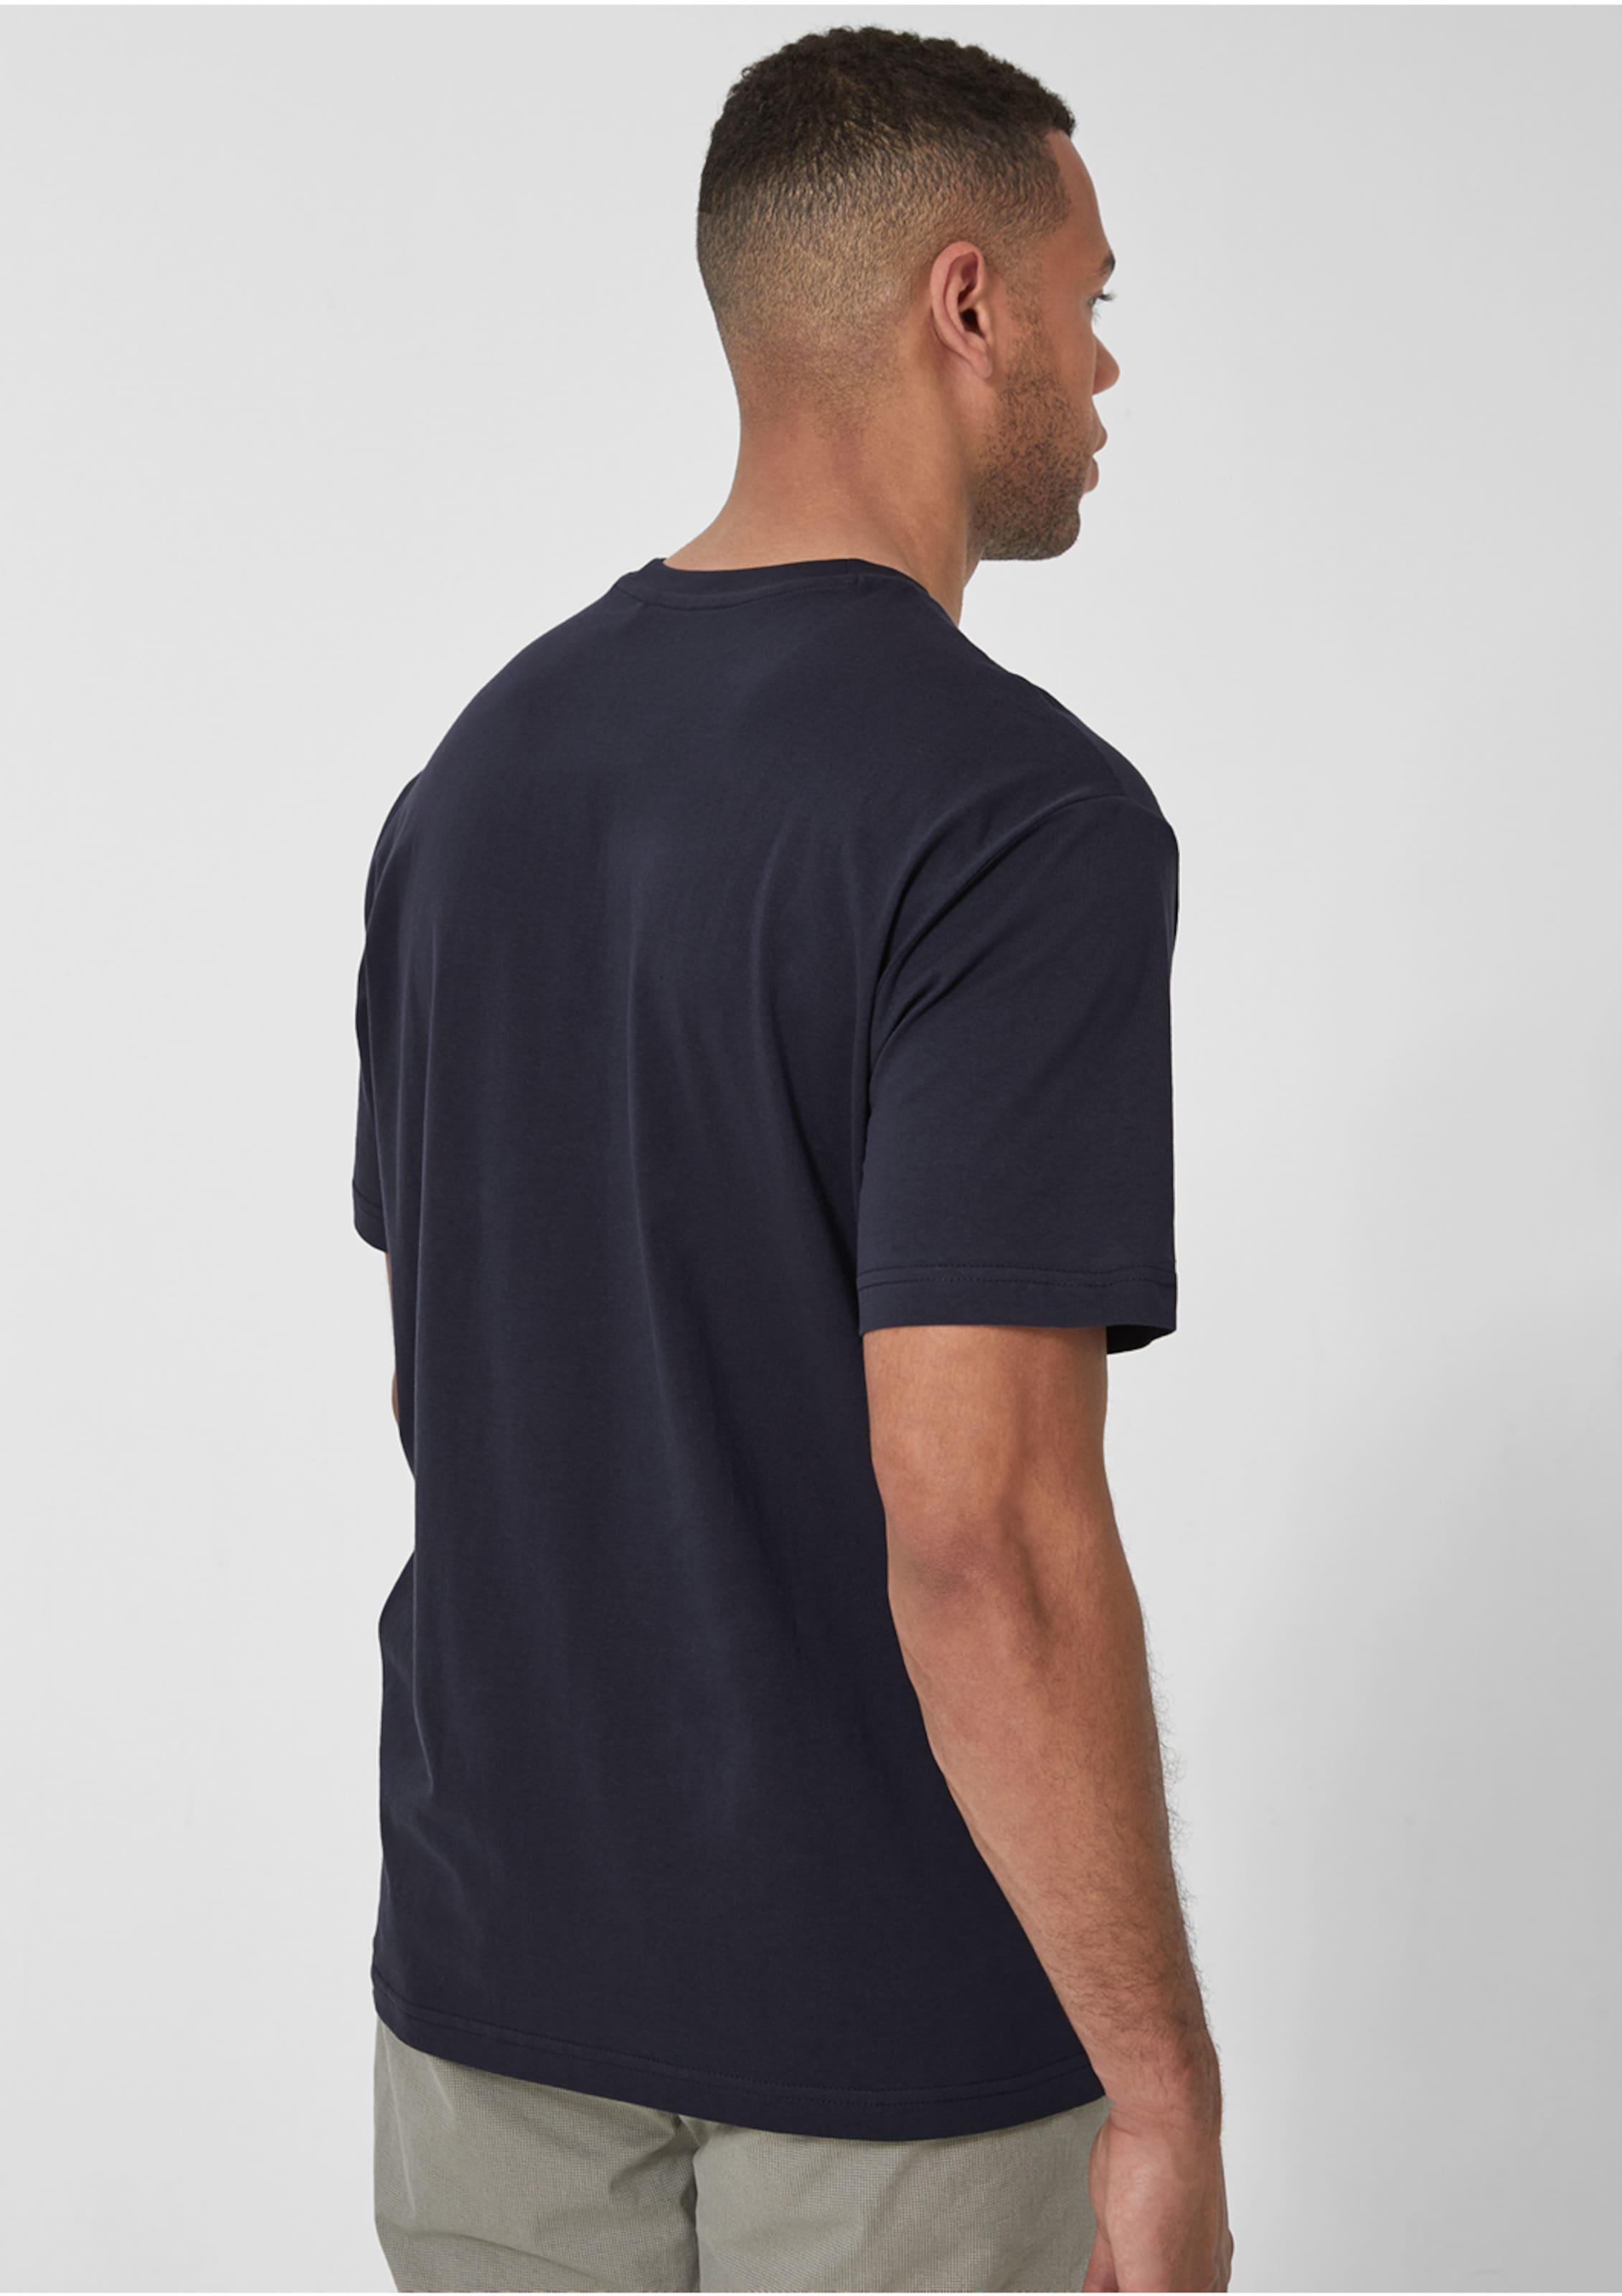 oliver In Red S shirt NavyAltrosa Label T QerECWxBod